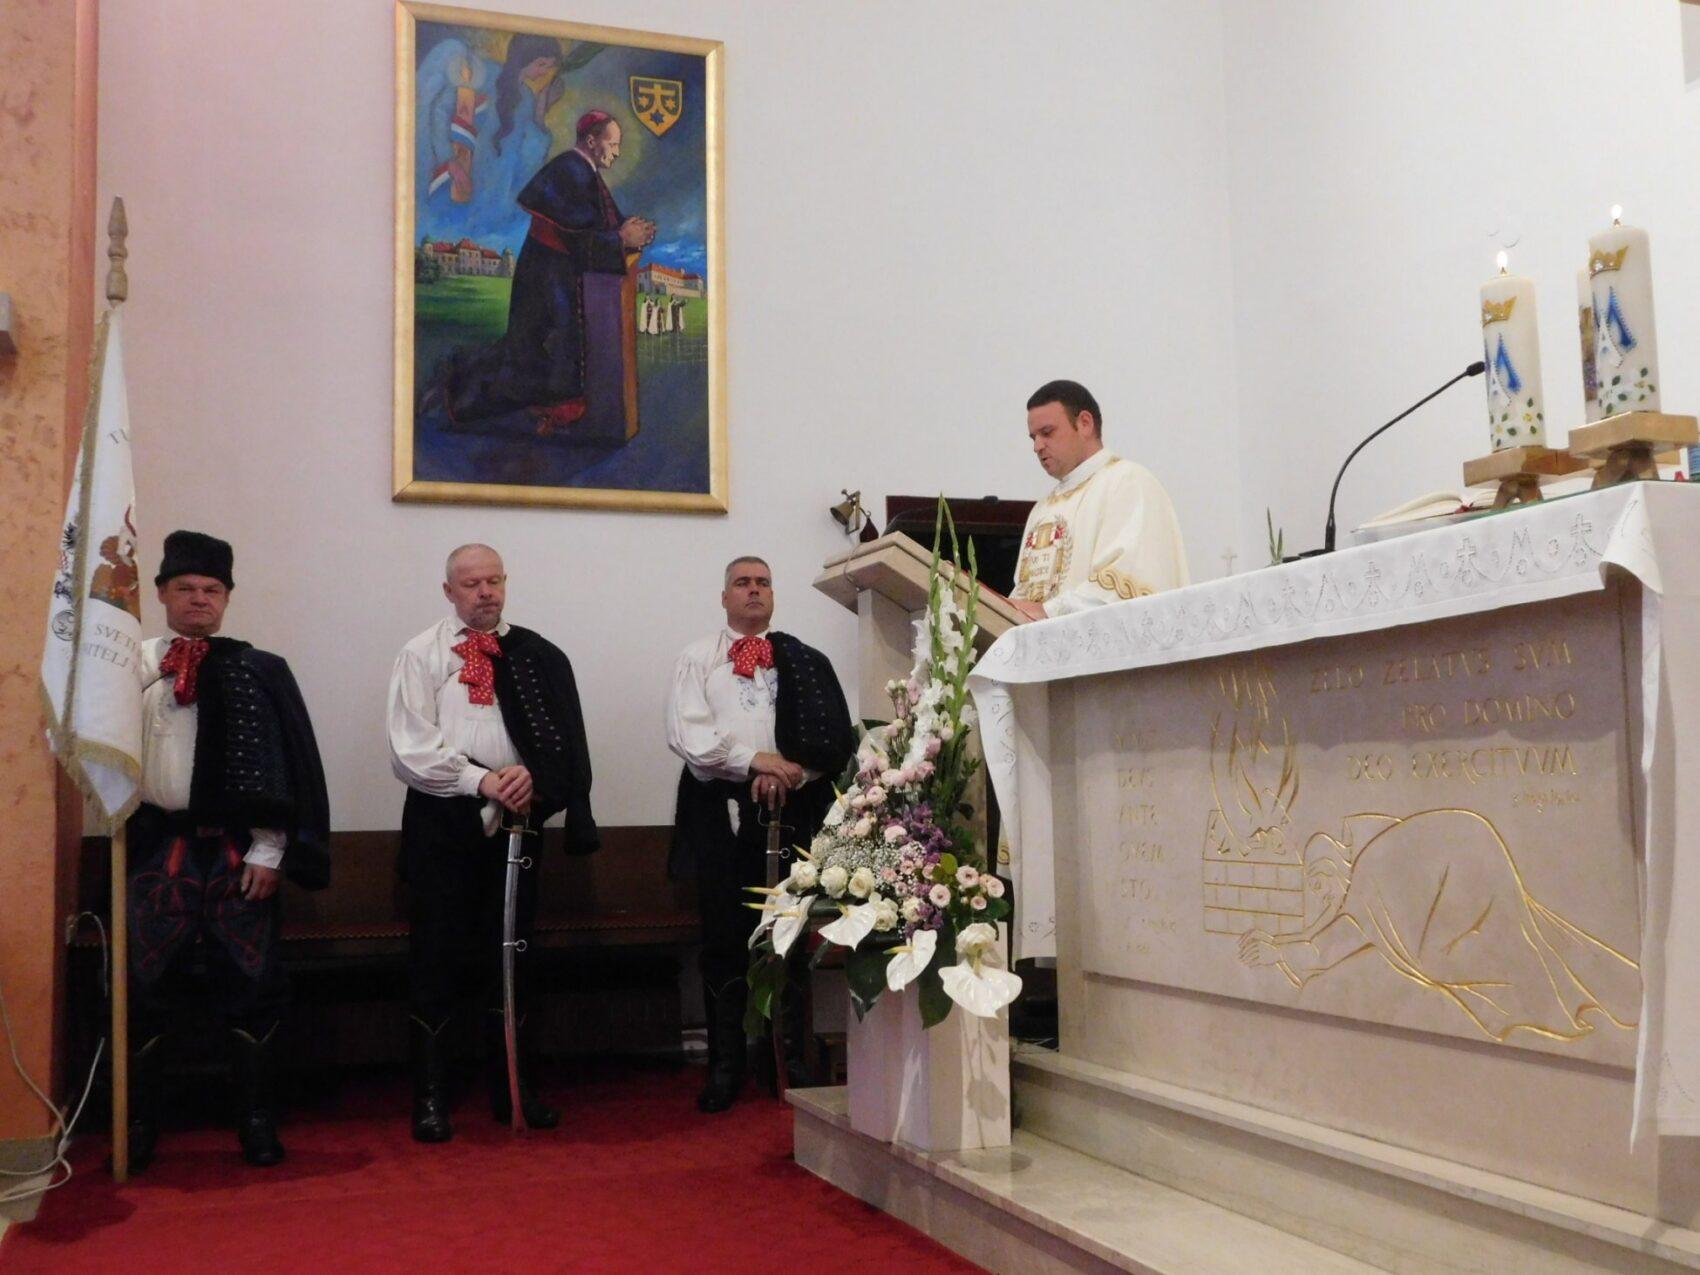 Proslavljeno proštenje Gospe Karmelske u brezovičkom Karmelu